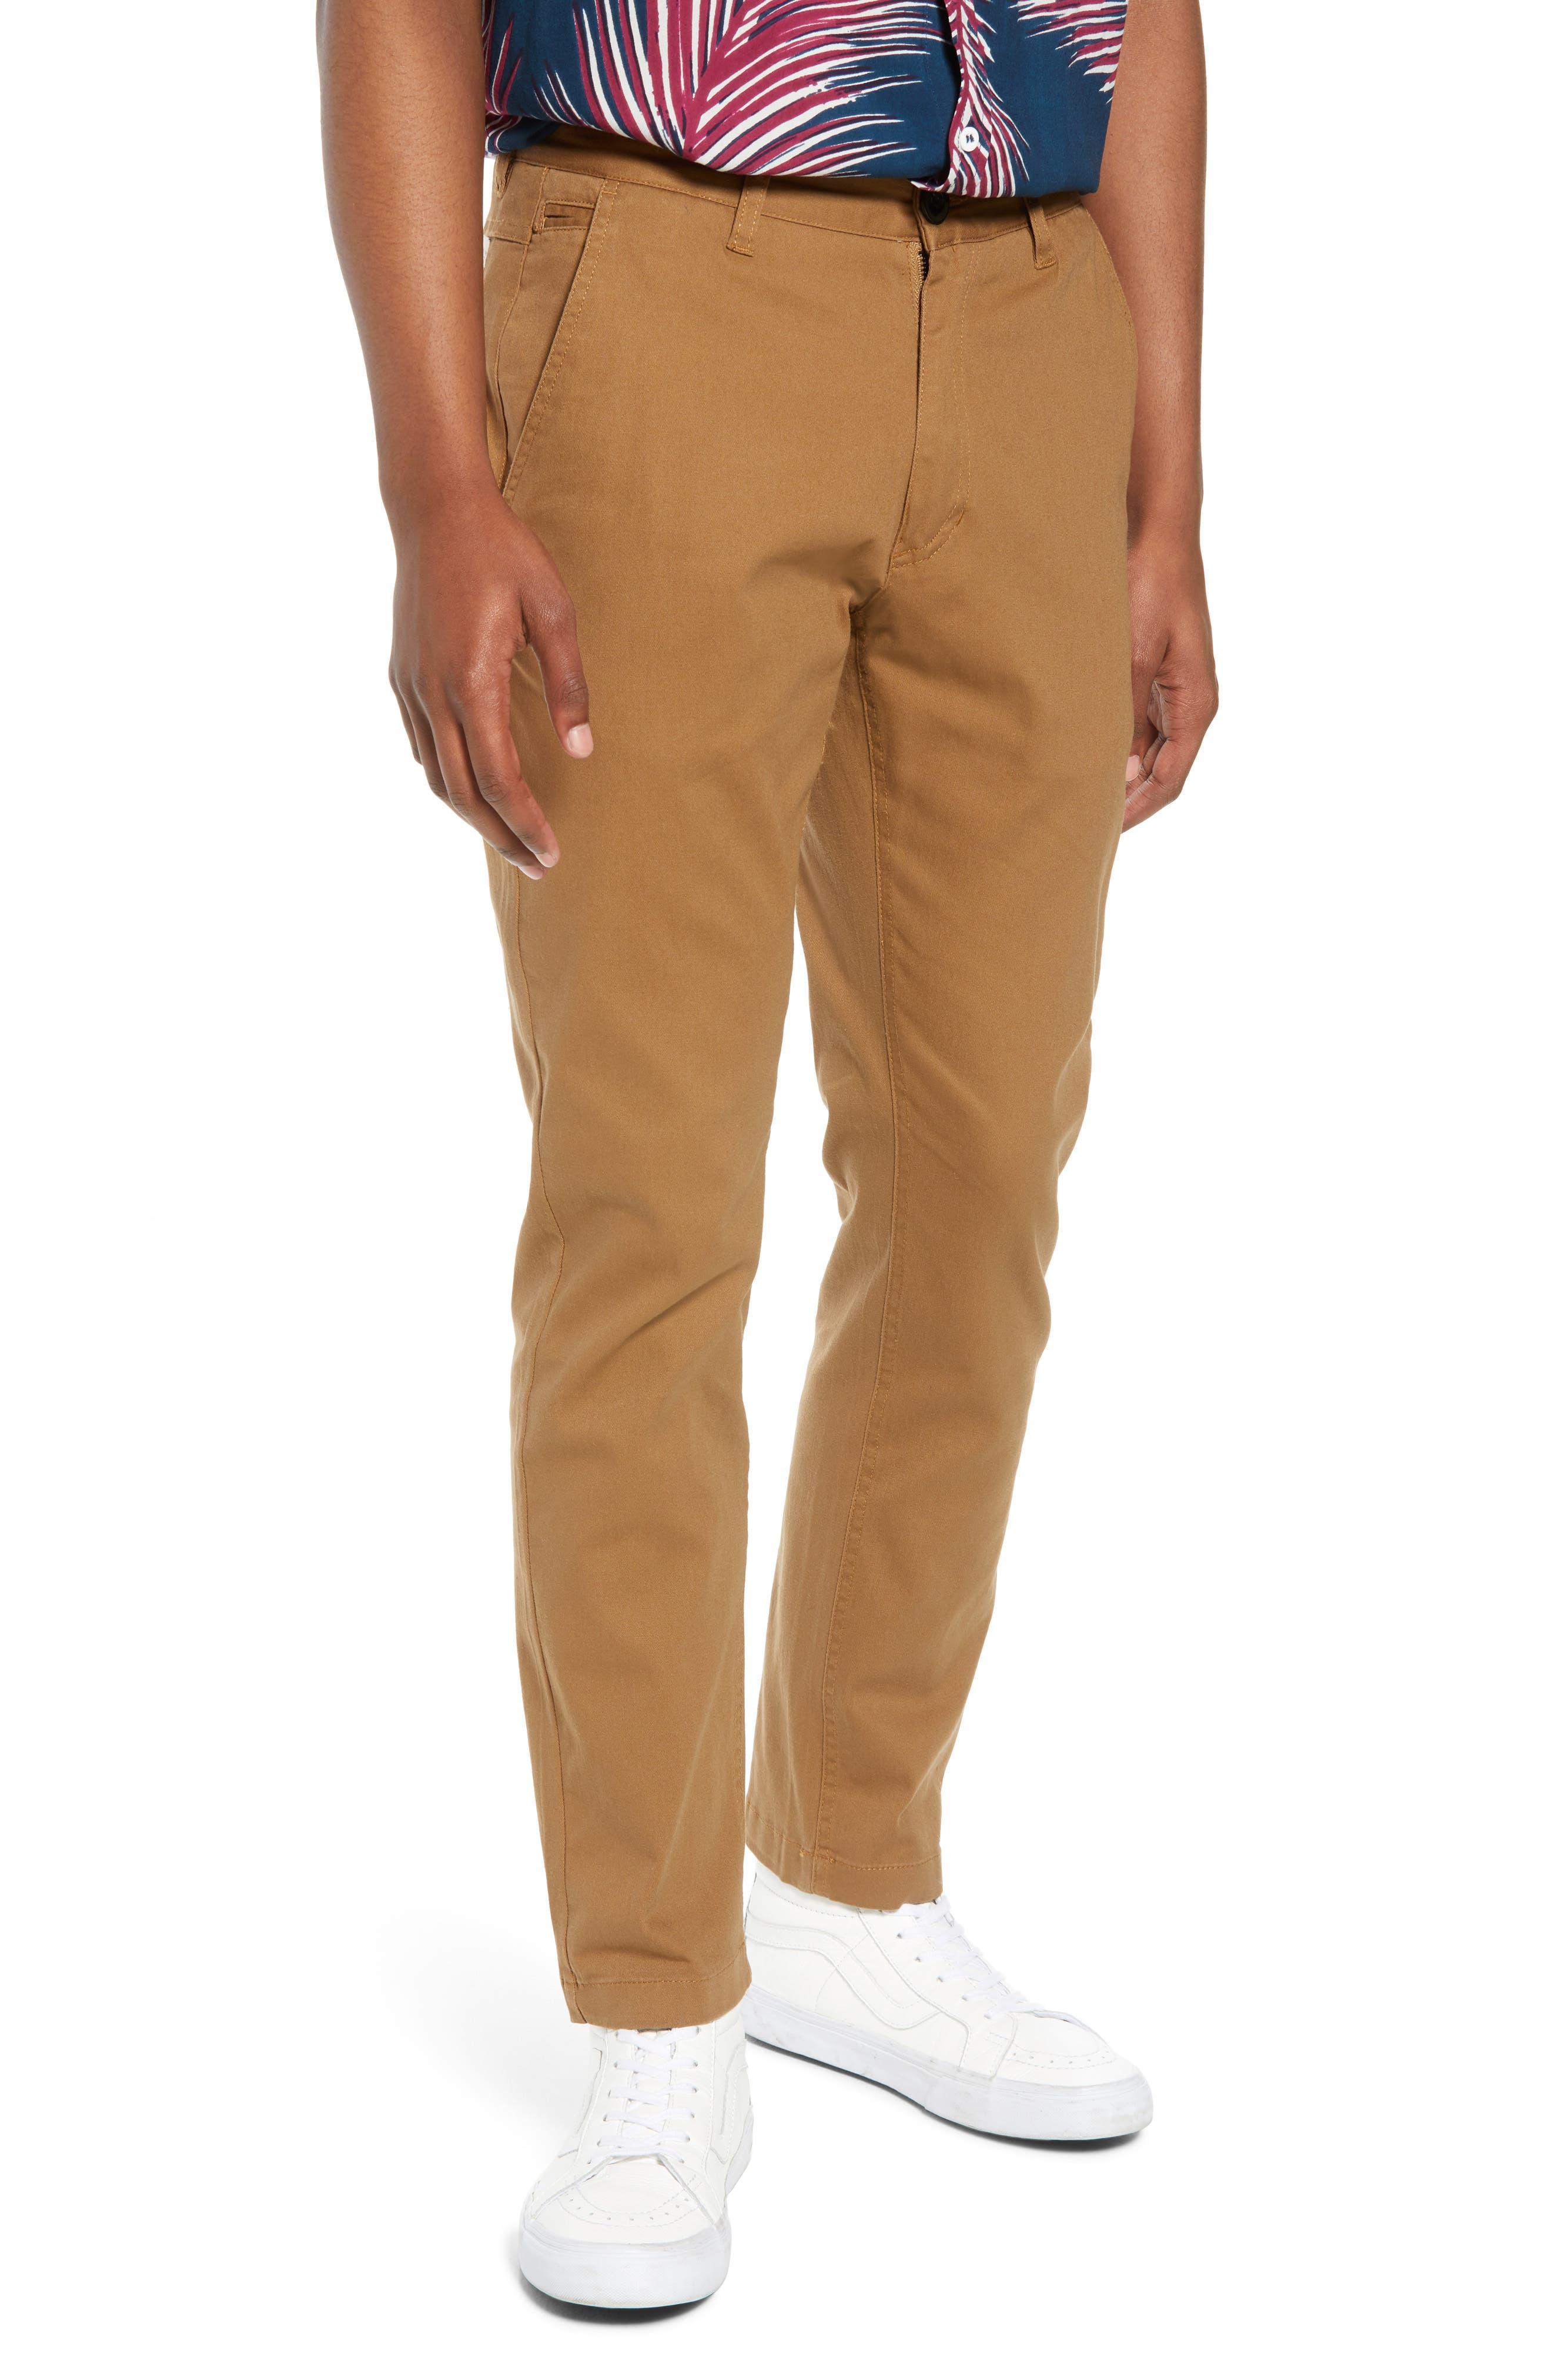 Lira Clothing Crossroad Slim Fit Pants